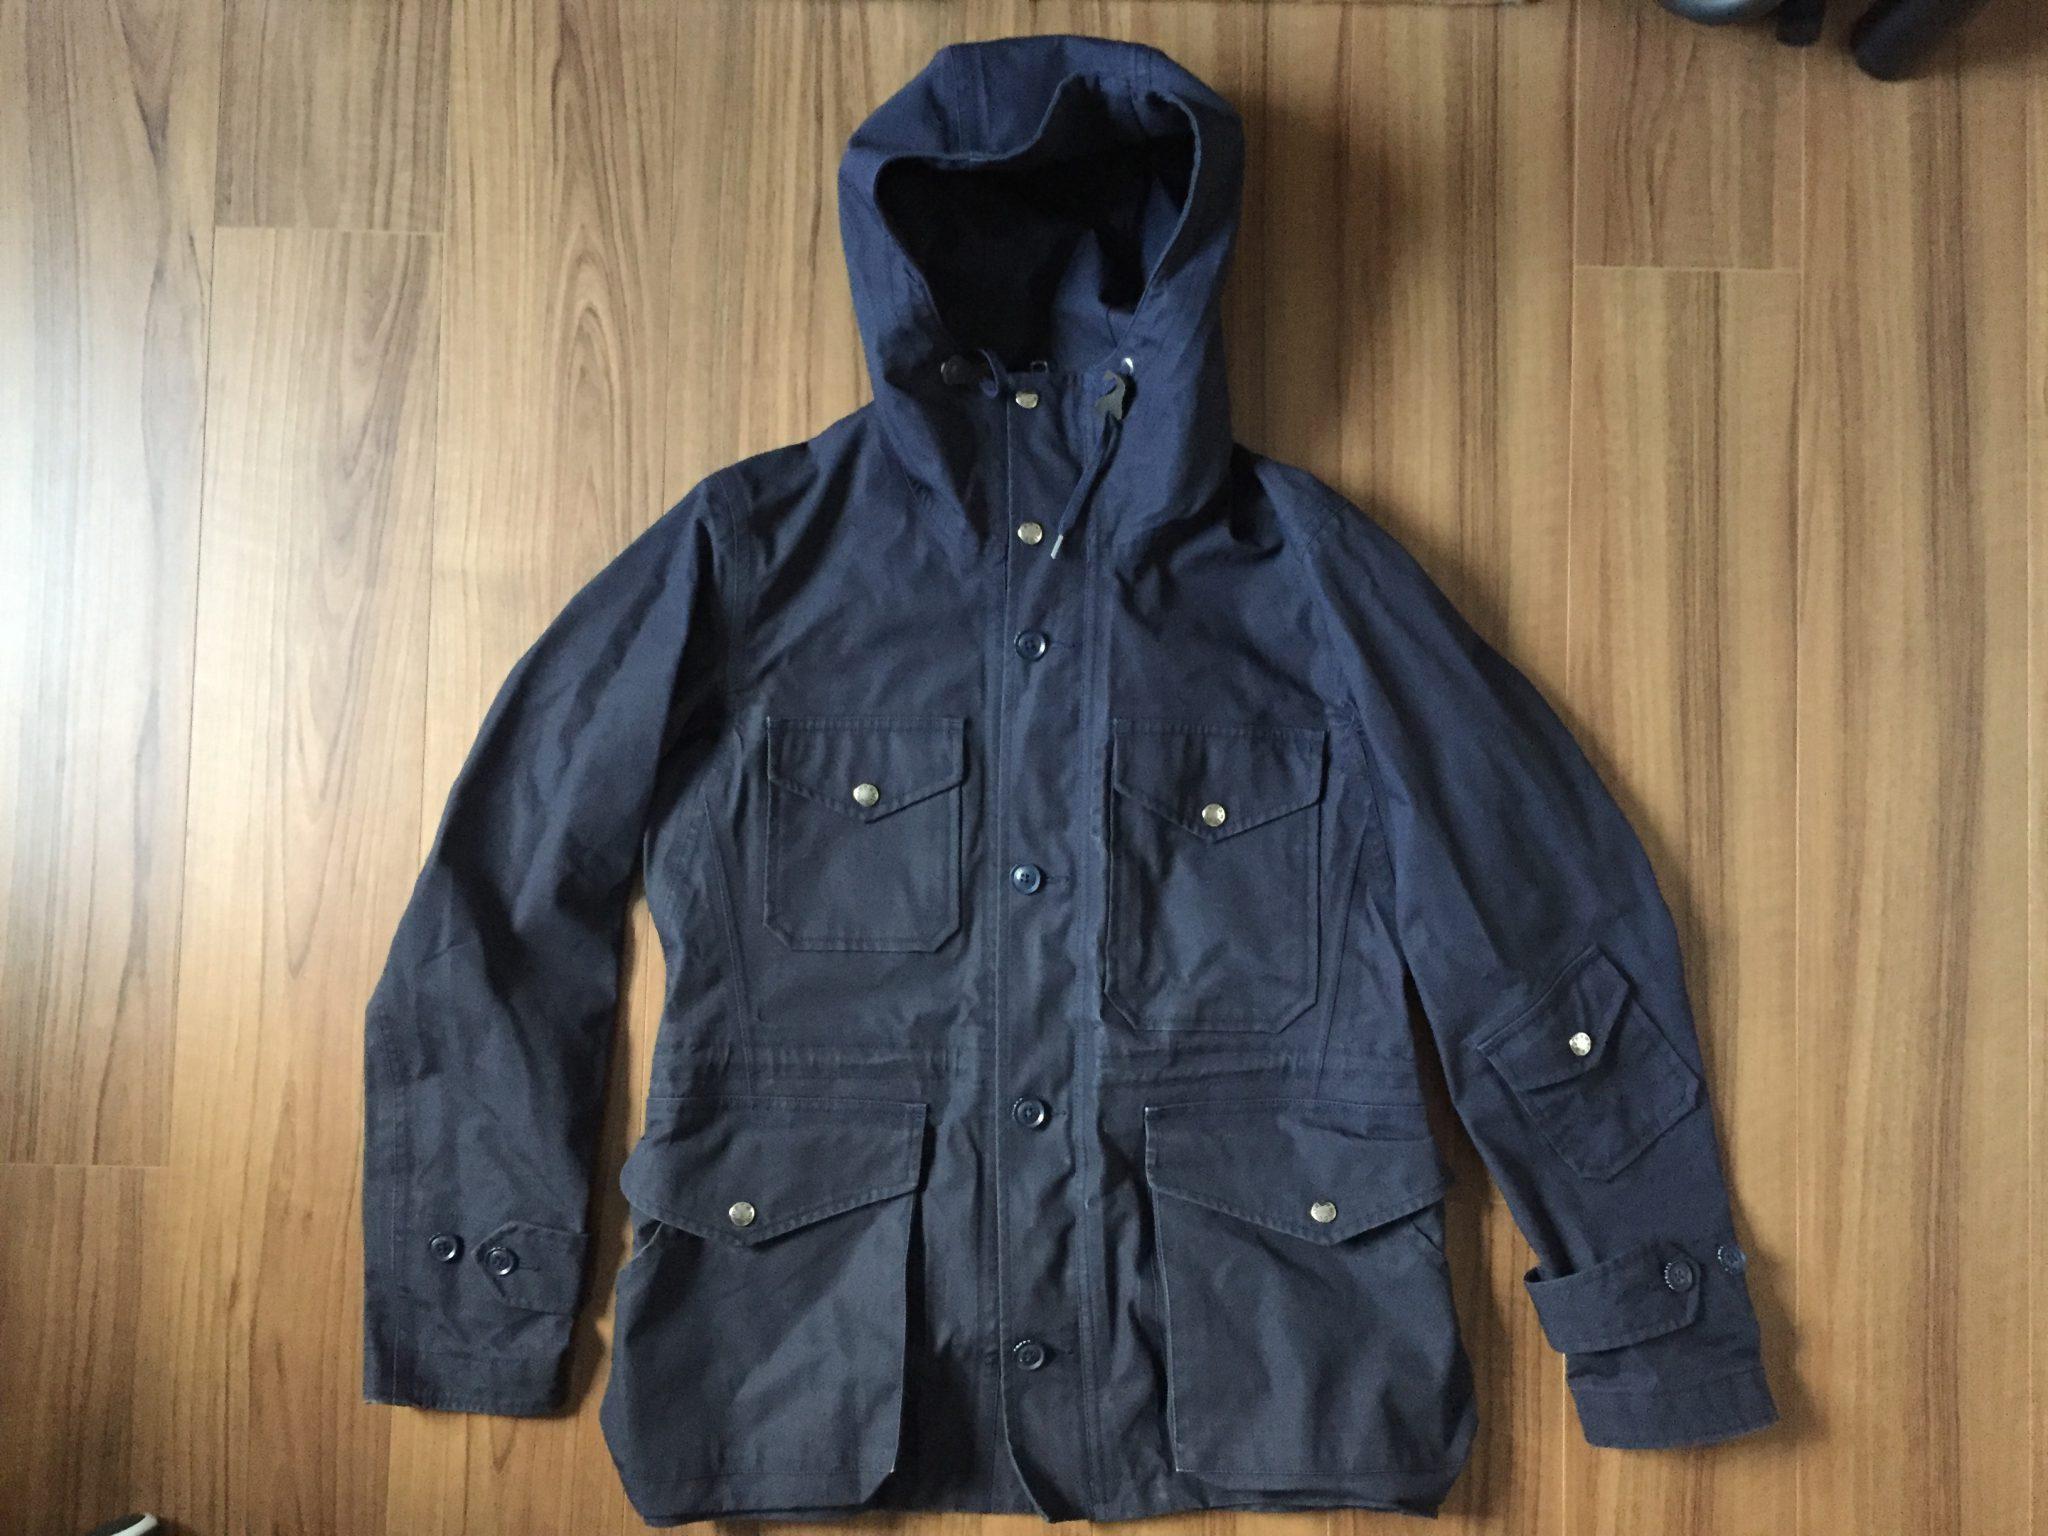 nanamica(ナナミカ)GORE-TEX Cruiser Jacketを自宅で洗濯&乾燥機にぶちこんでさっぱりさせた